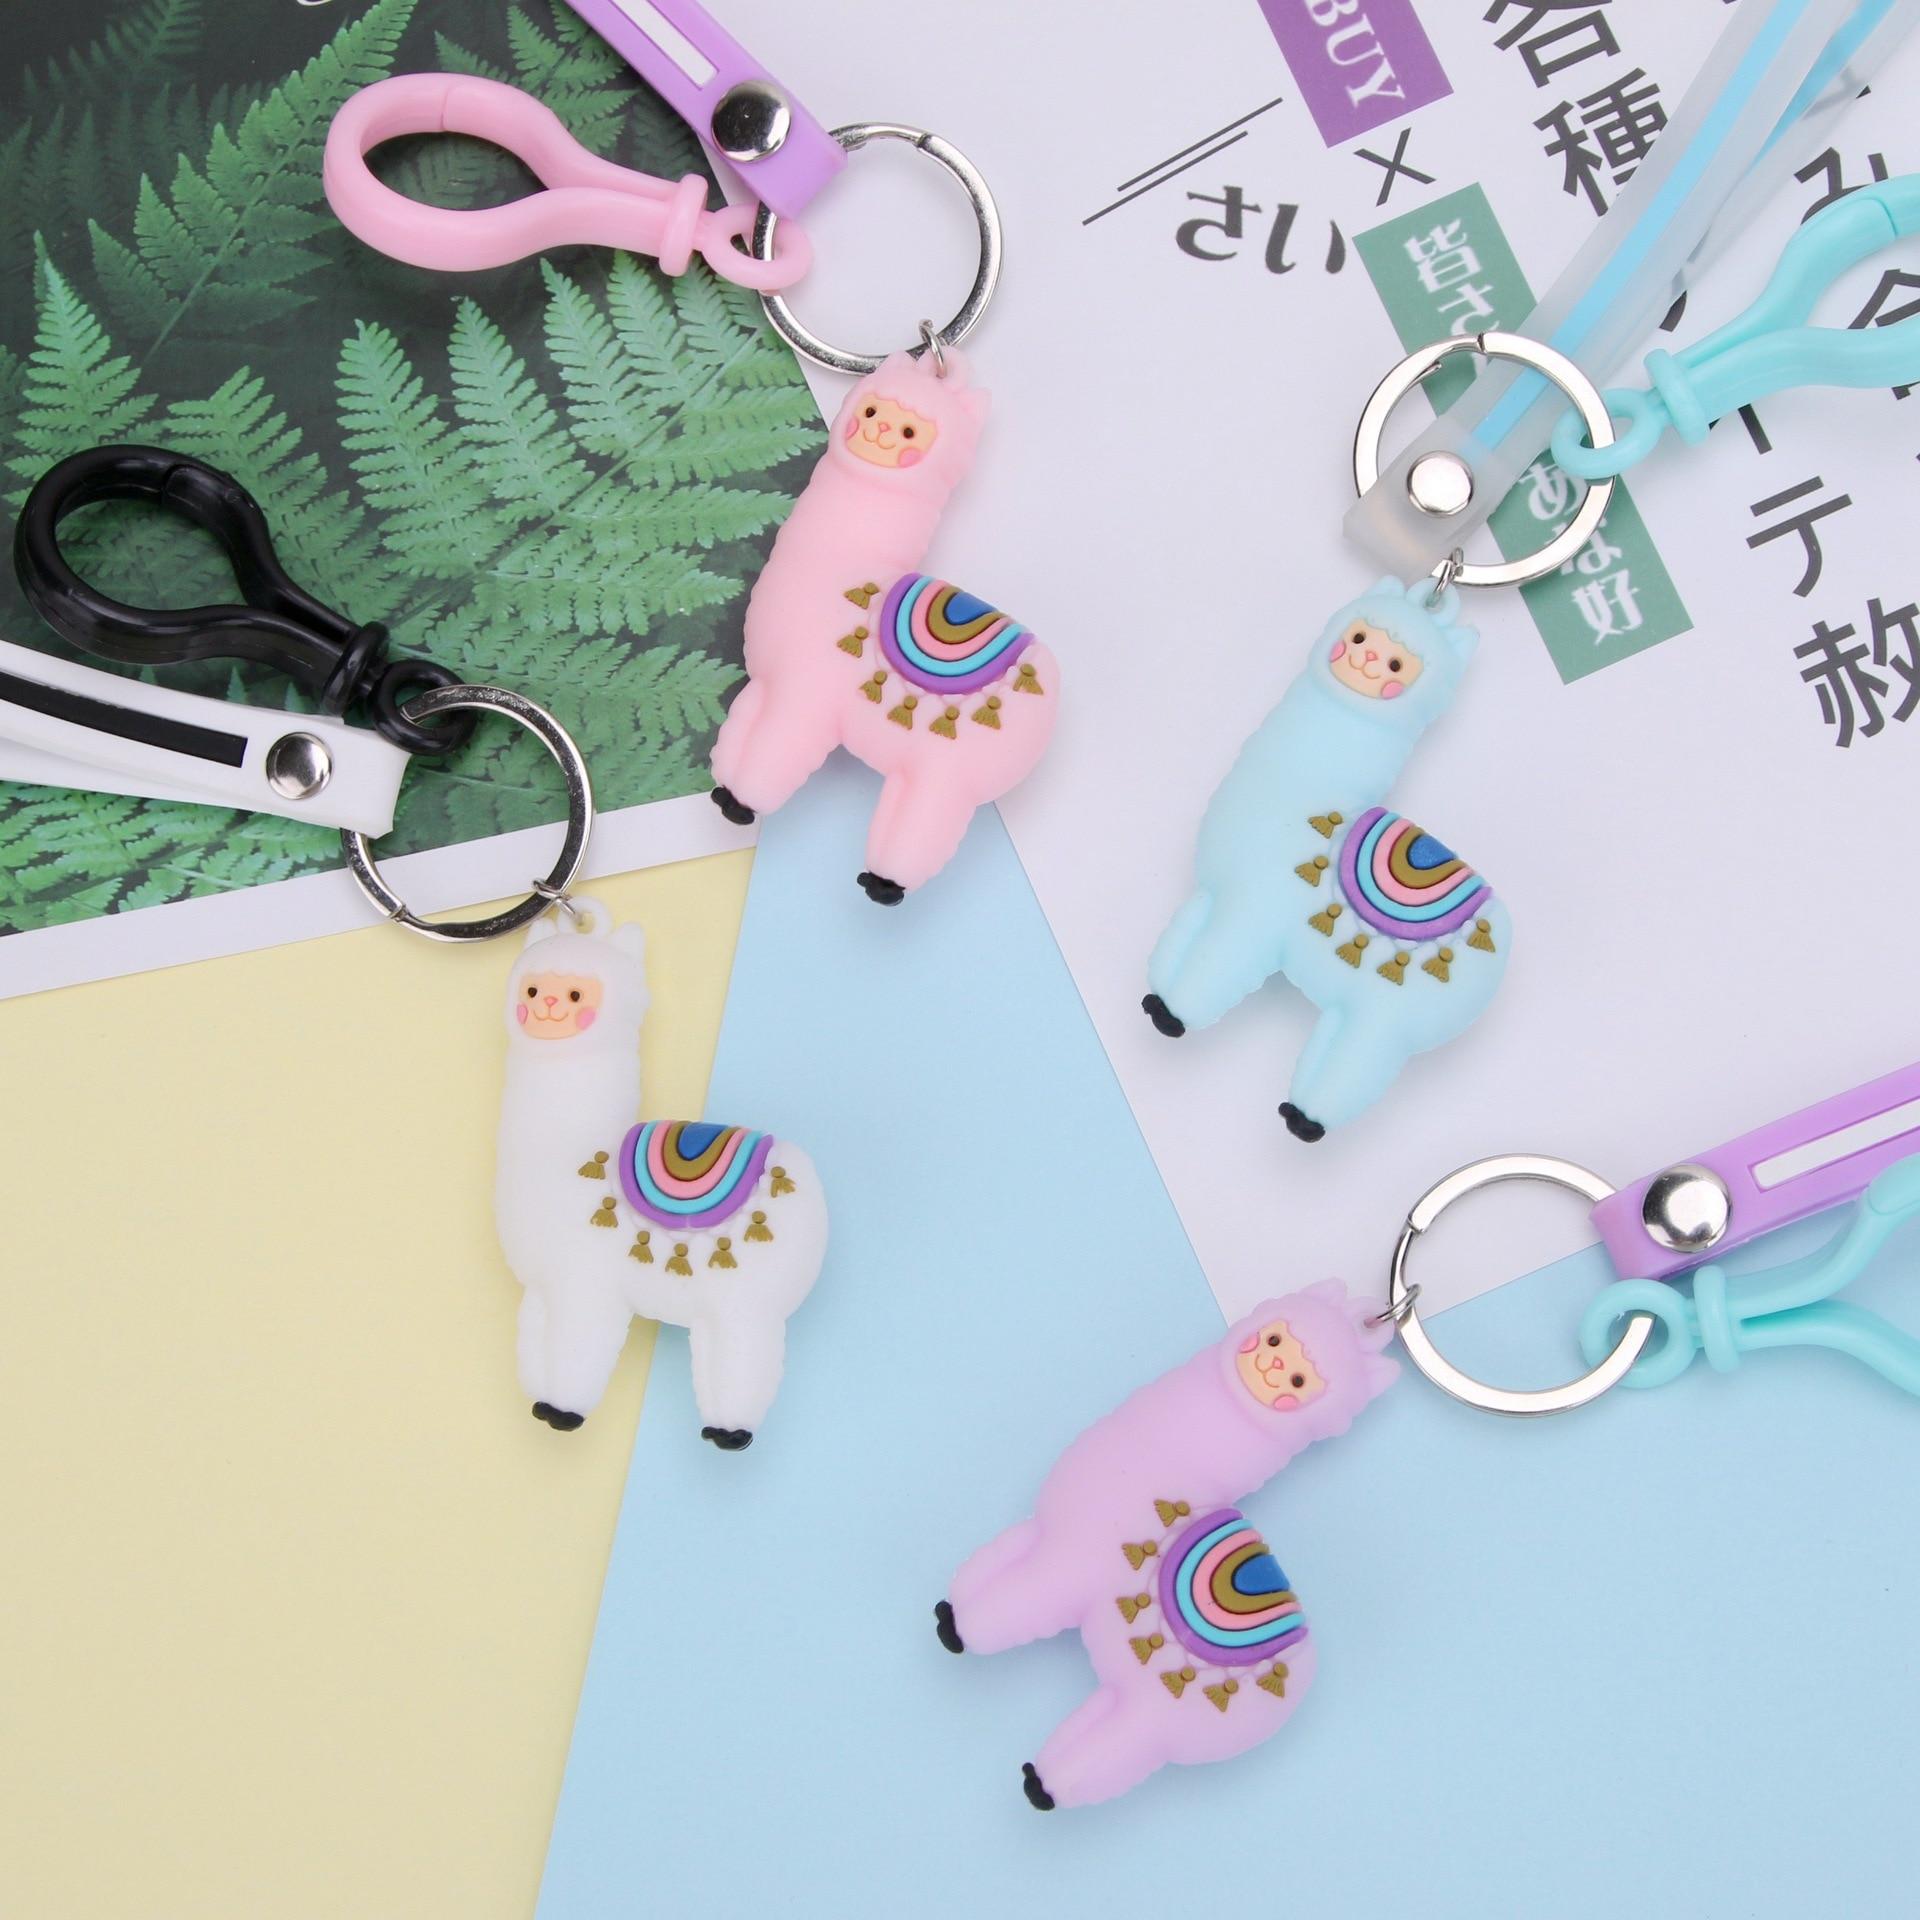 2020 Fashion Cute Keychains Lamb Resin Alpaca Charm Landscape Creative Accessories Key Chain Pendant DIY Key Ring